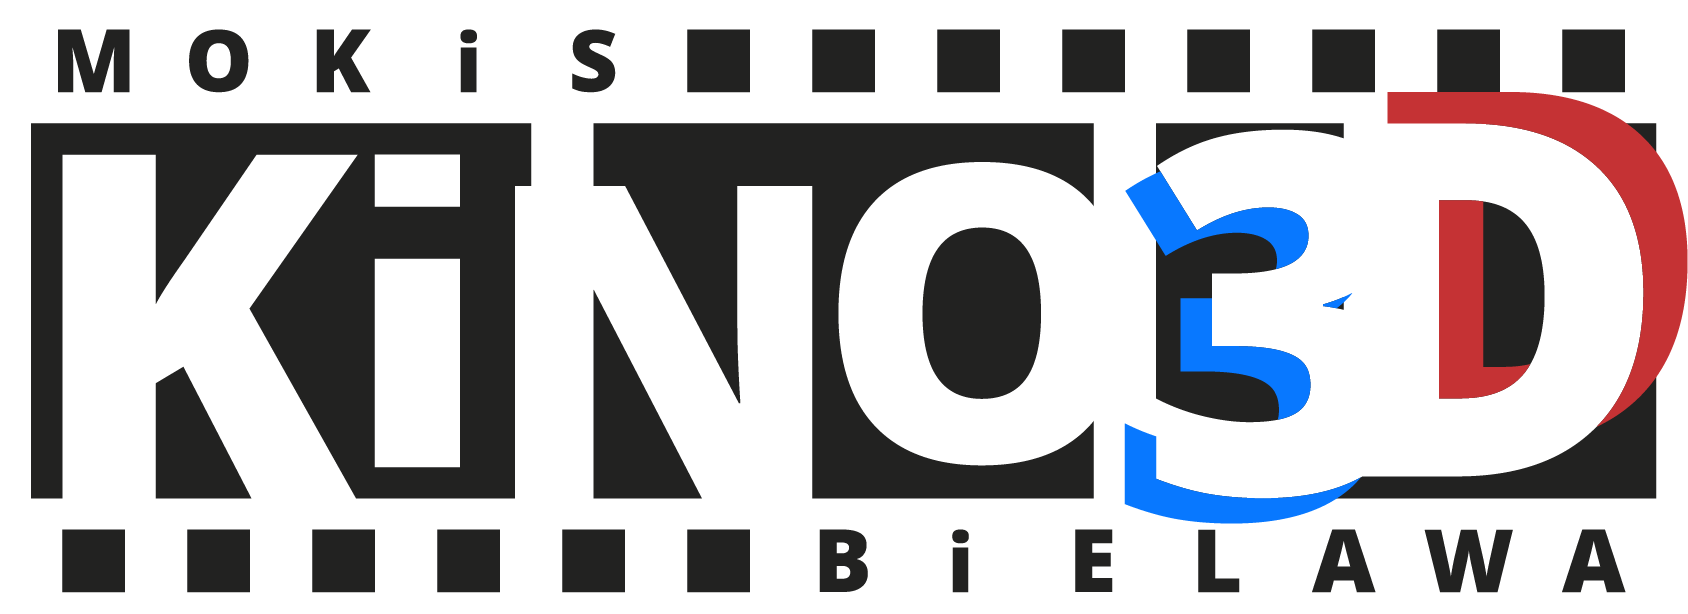 Kino 3D MOKiS Bielawa